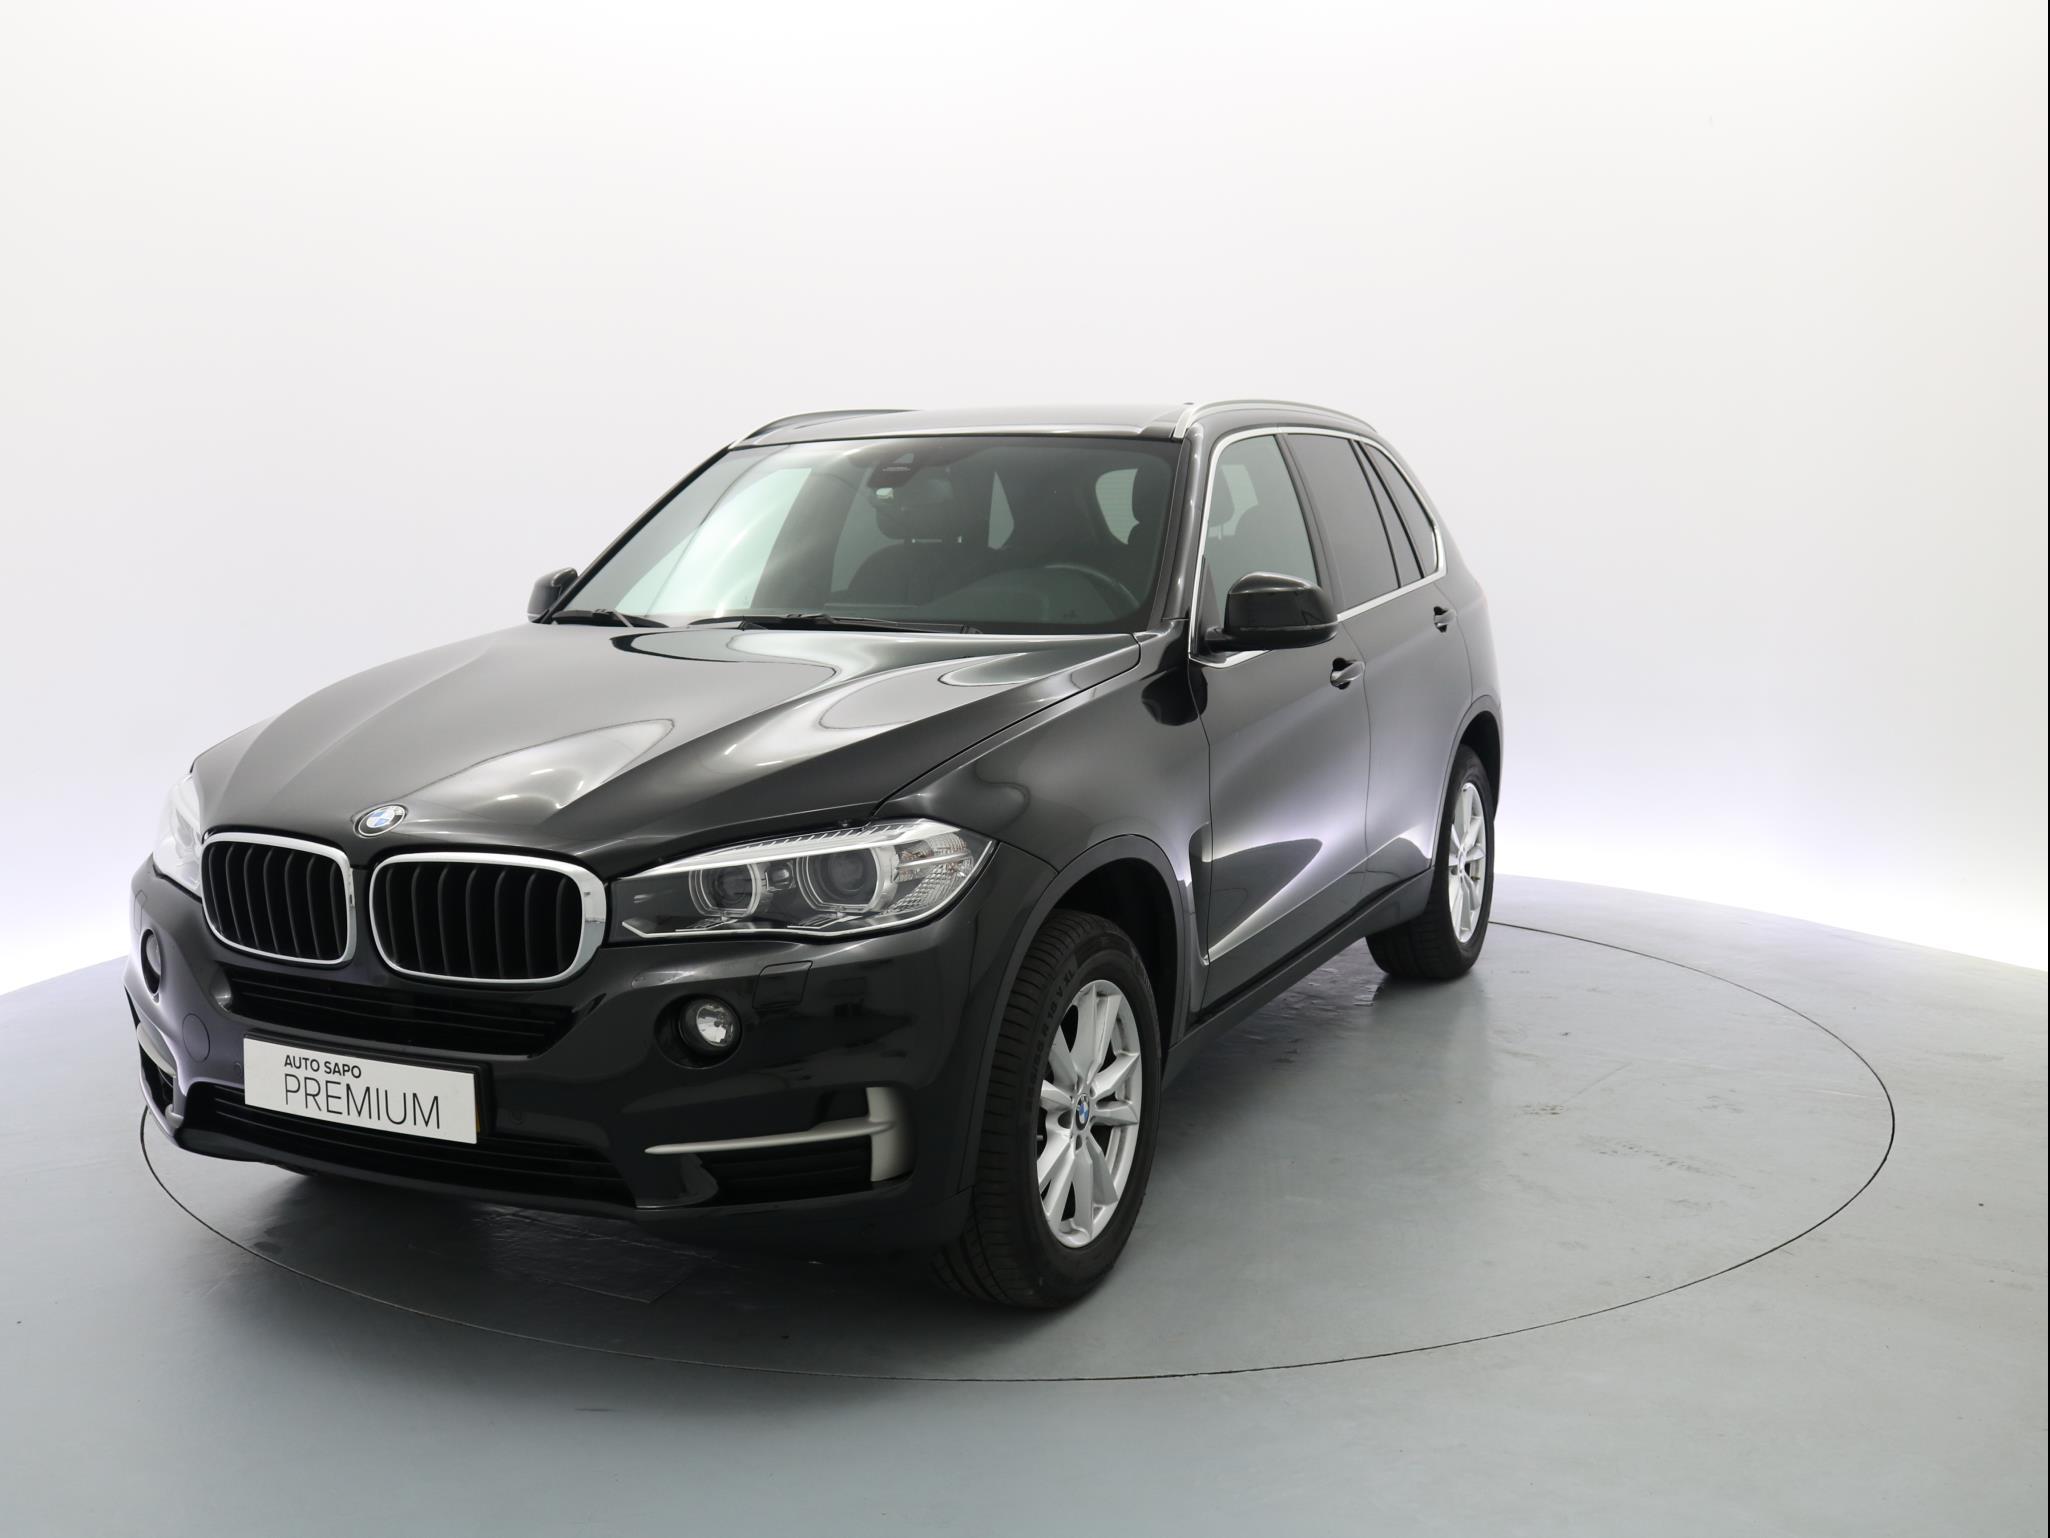 BMW X5 2.5D sDrive